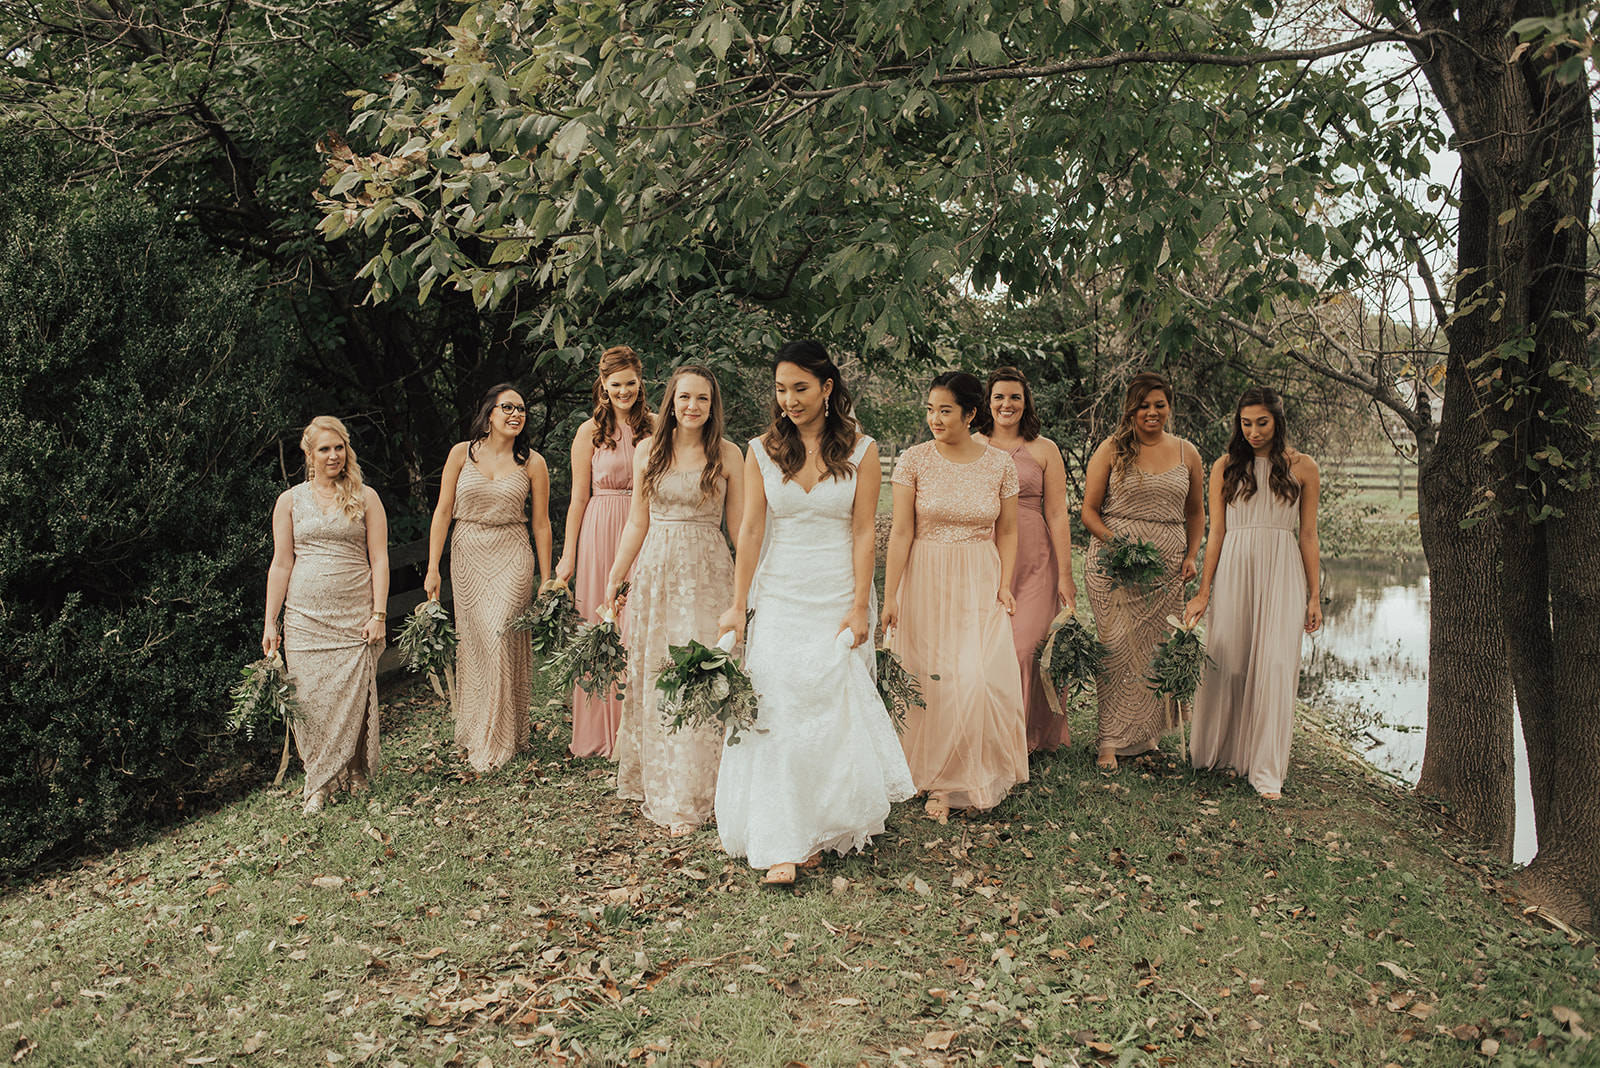 Sylvanside Farm Winter Wedding By SB Photographs616161061006161610616161616161295295295061000616161061.jpg